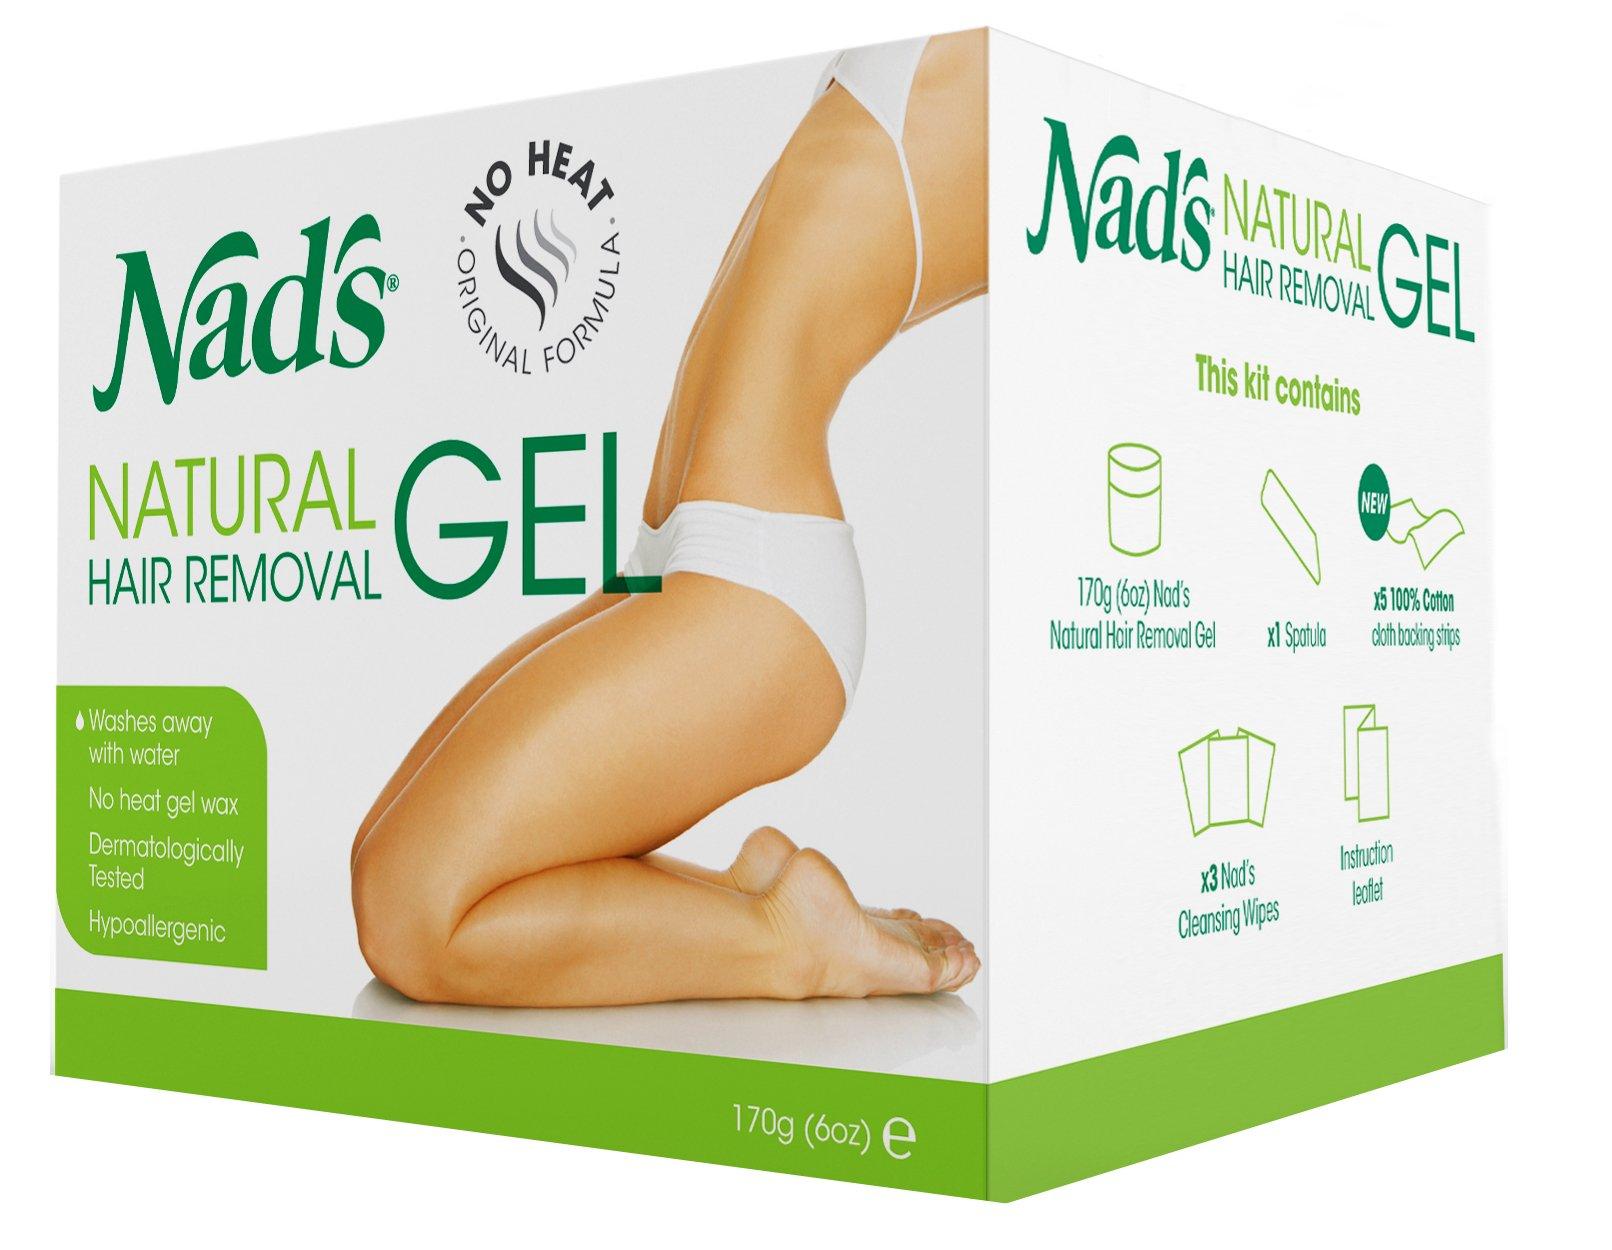 Nad's Natural Hair Removal Gel, 170g